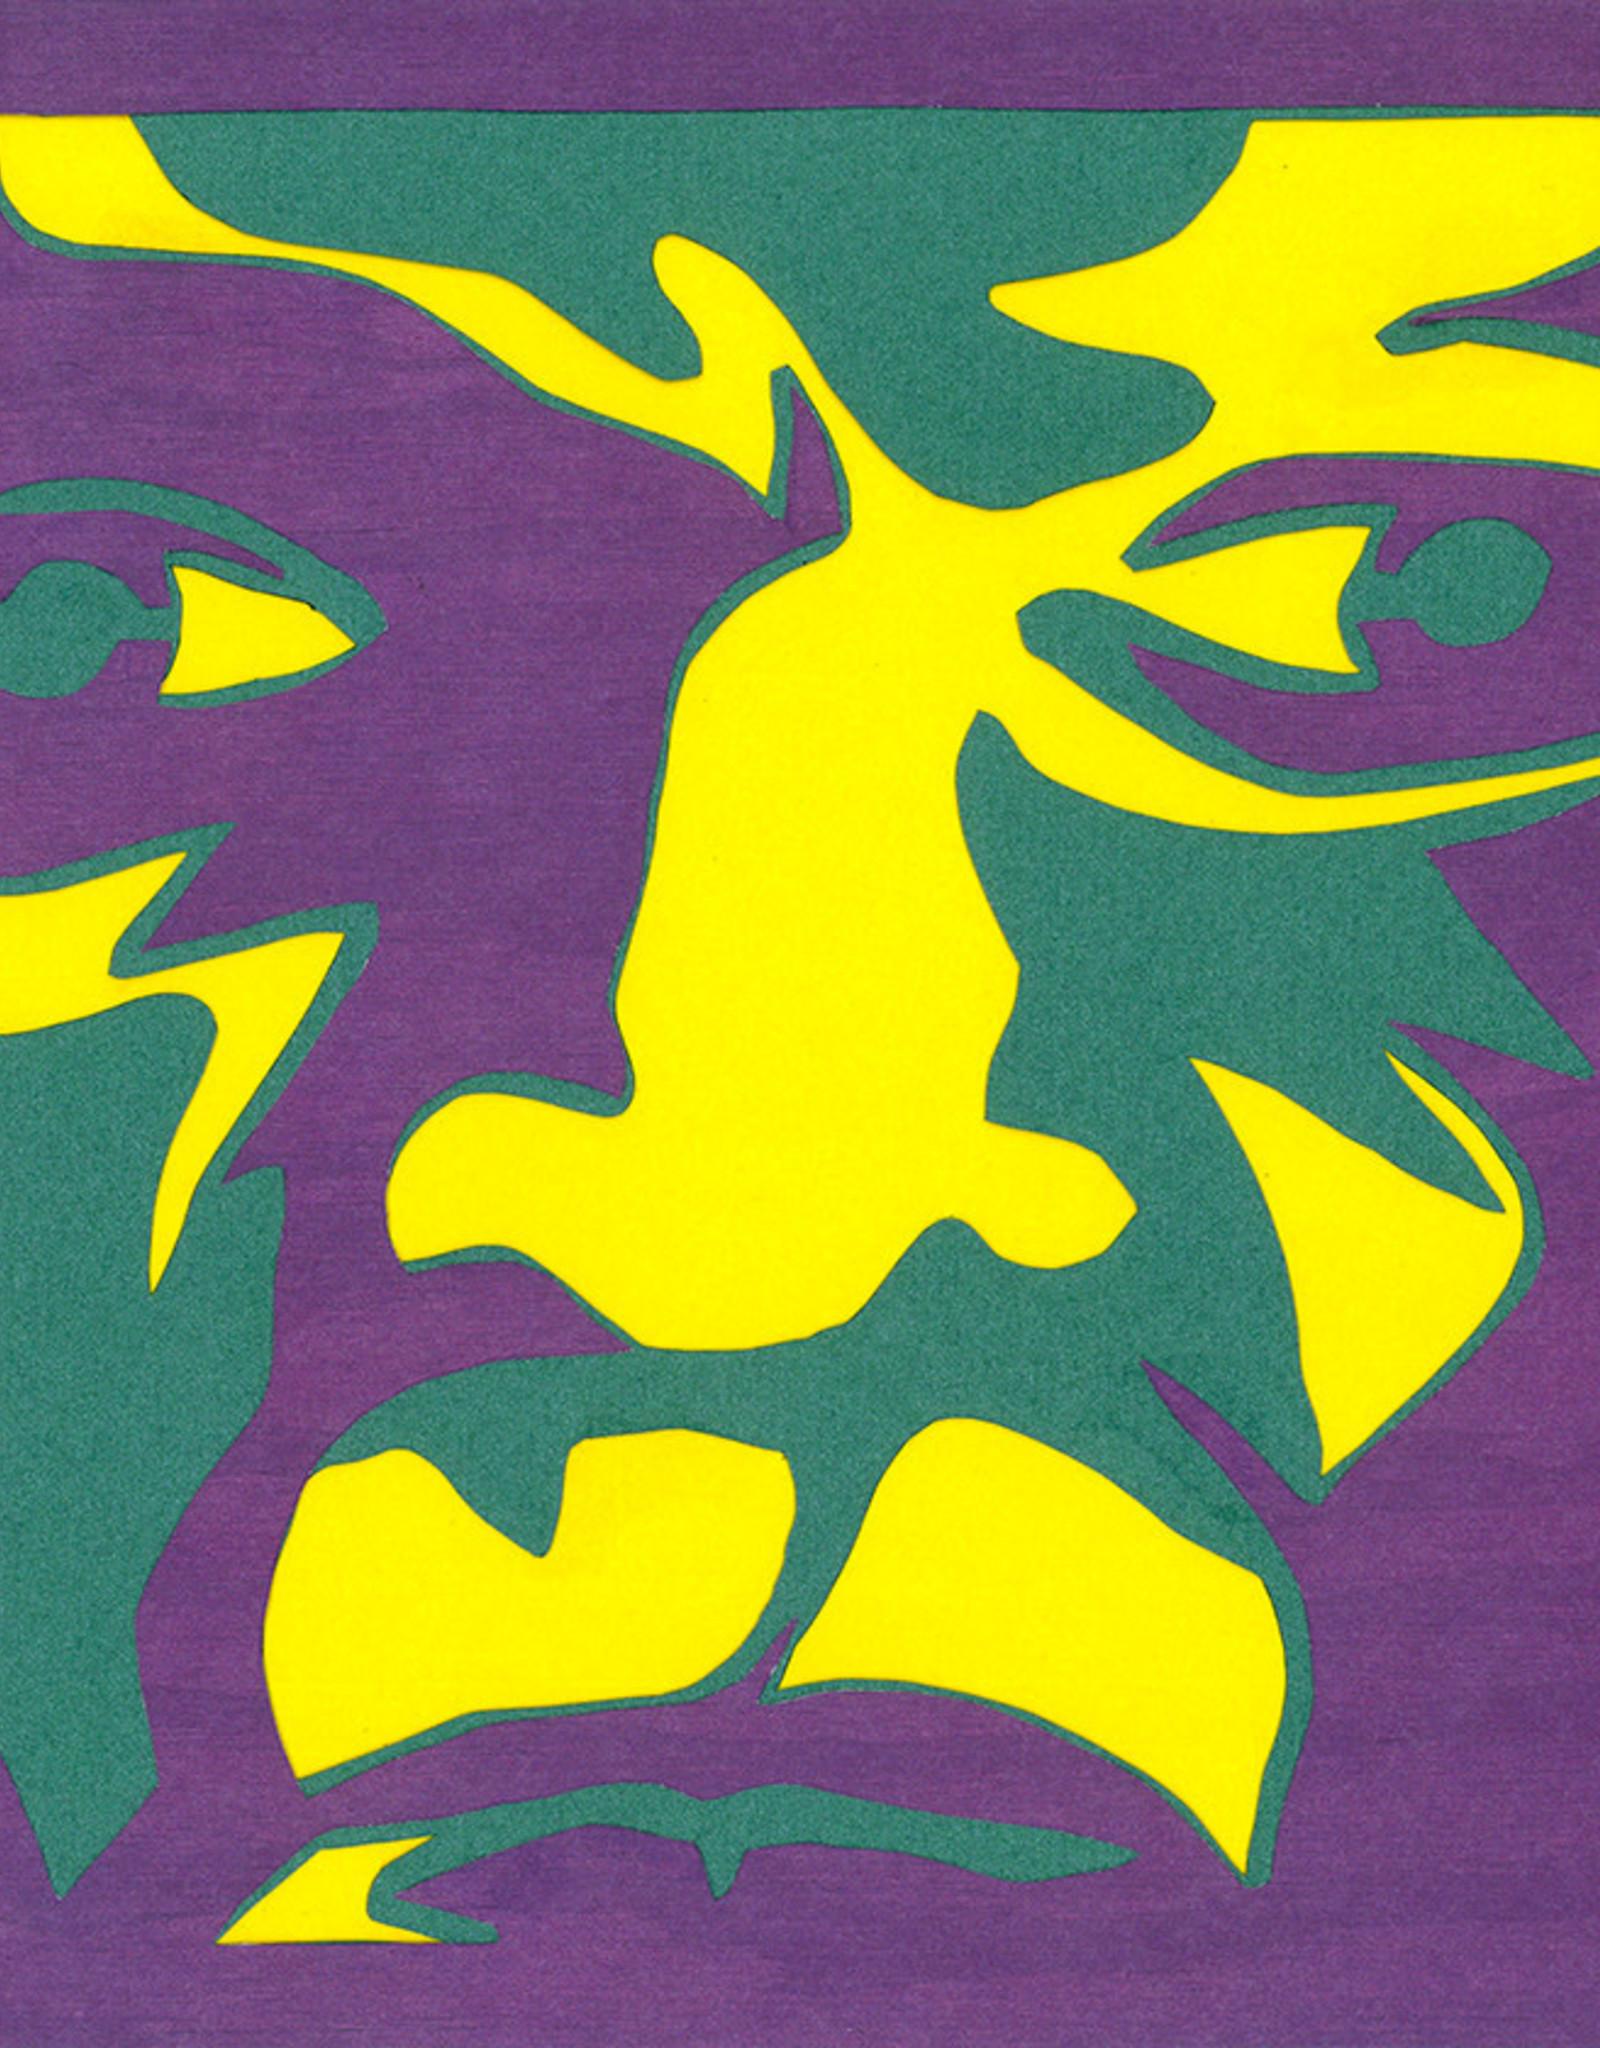 Gray Jones Face to Face -Cutout 9x12 #9